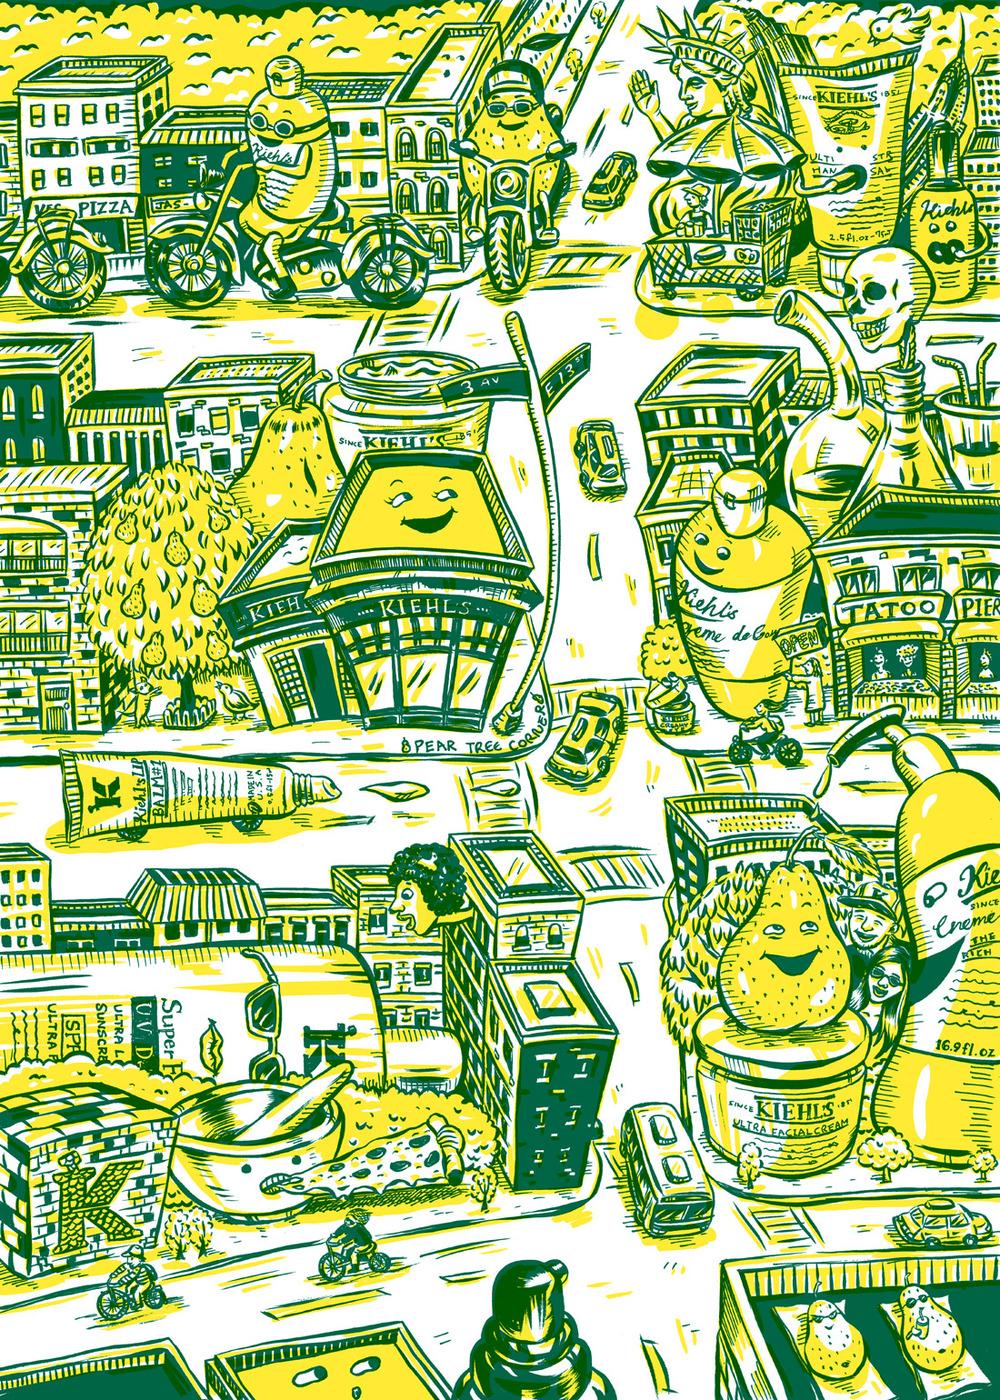 HOW 2013, SOI 55 2012 - ARTIST: Jungyeon RohTITLE: Map [1 of 2]CLIENT: Kiehl's